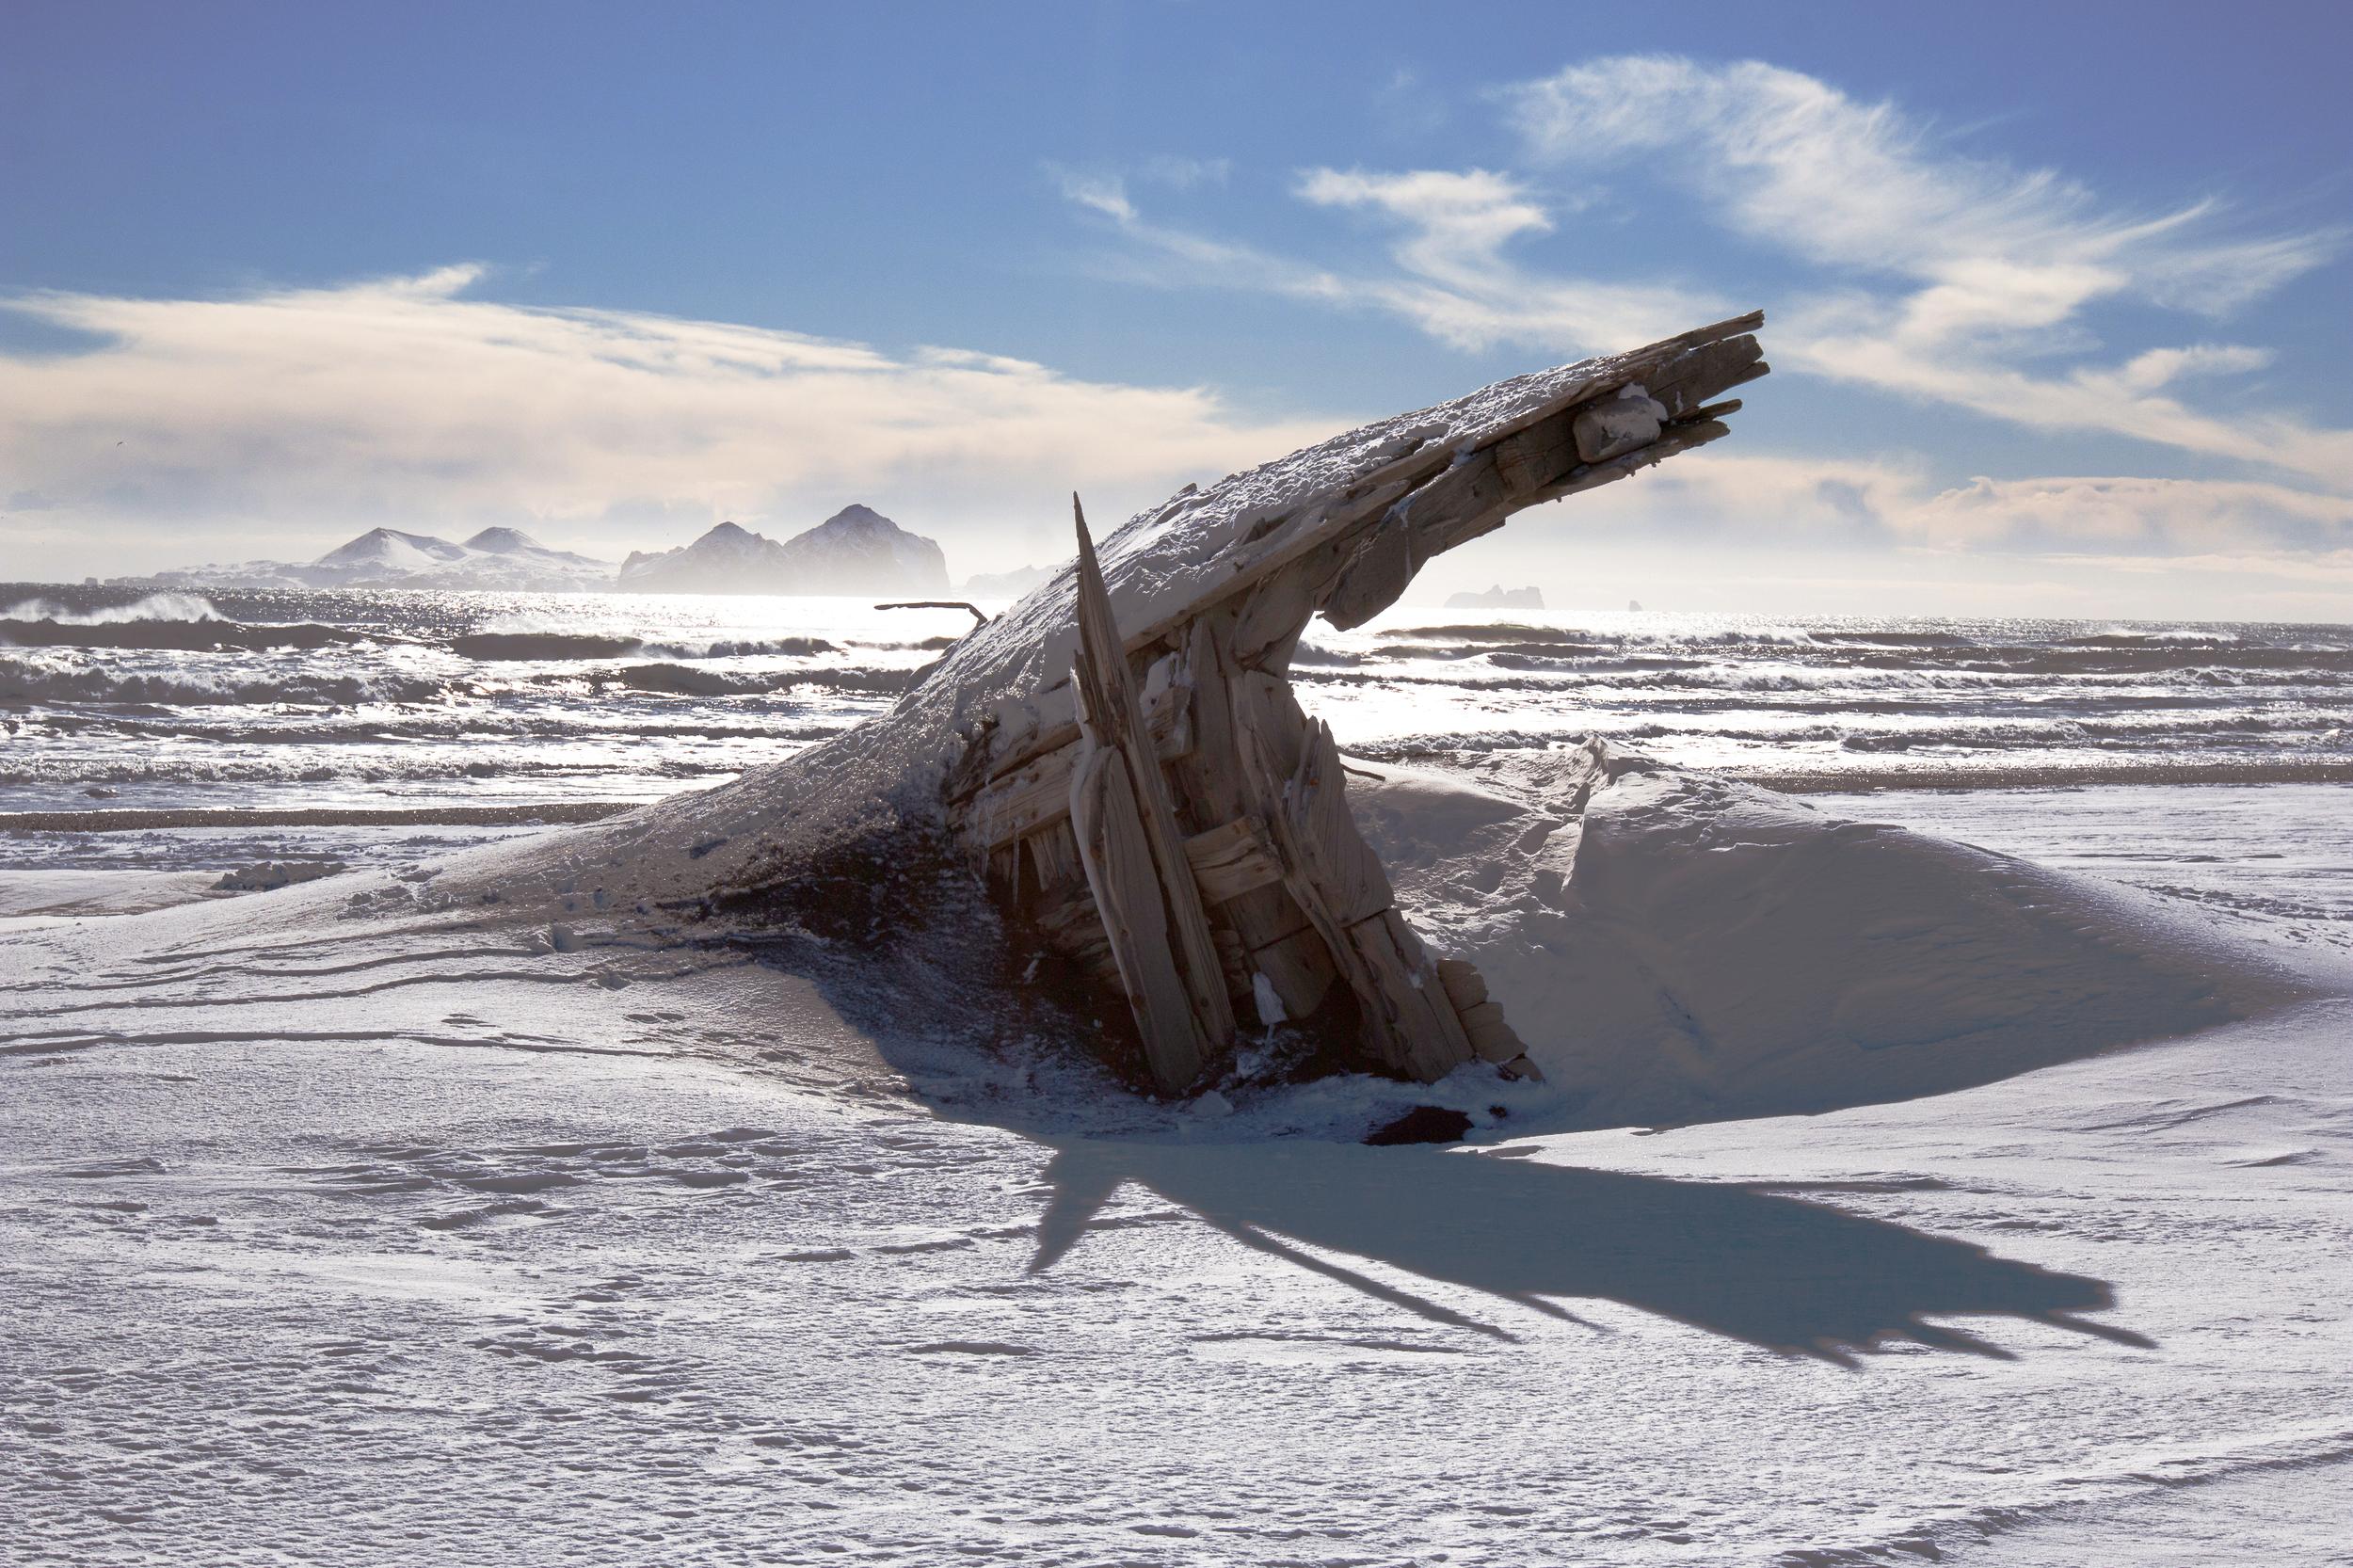 Shipwreck on Landeyjahöfn Beach